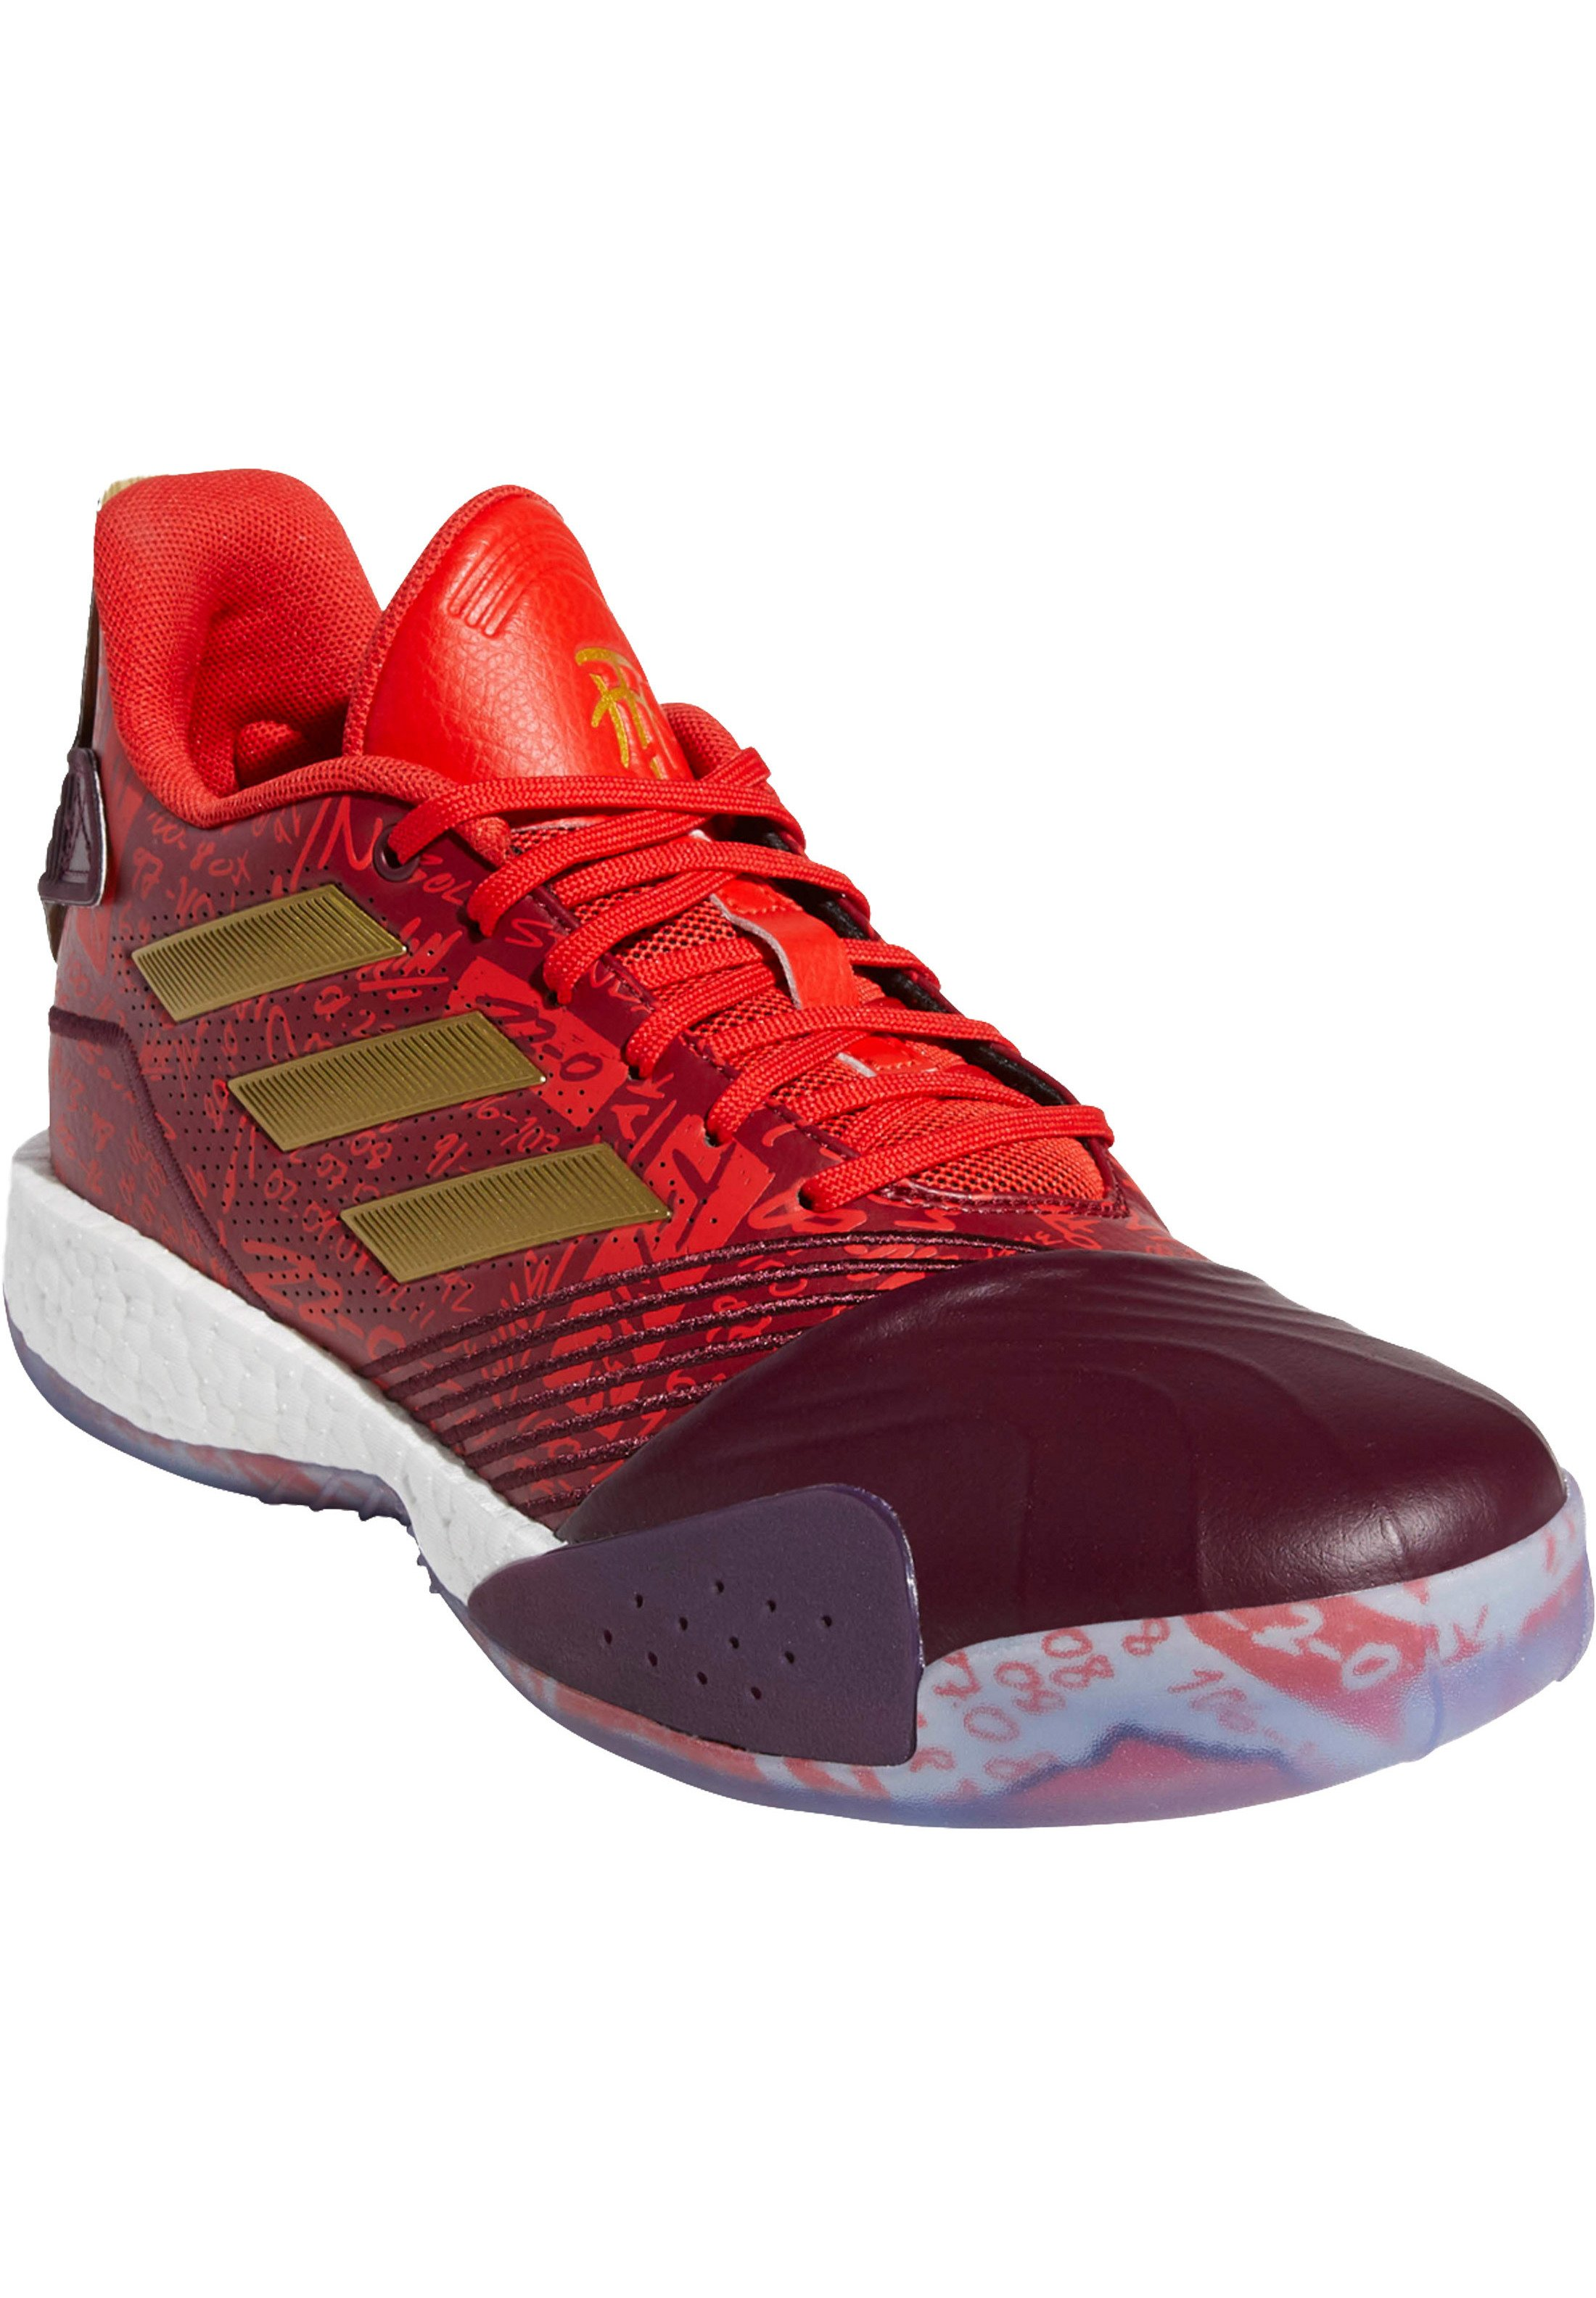 adidas Performance T-MAC MILLENNIUM  - Basketballschuh - collegiate burgundy / footwear white / maroon/bordeaux - Herrenschuhe JBes1